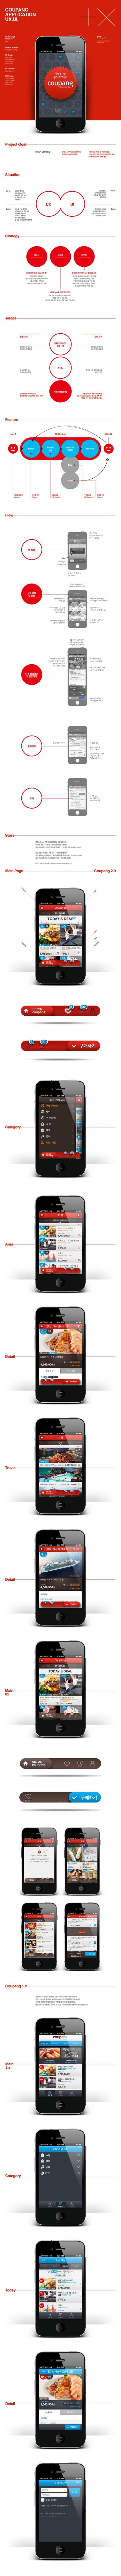 Coupang Application UX/UI by Plus X , via Behance